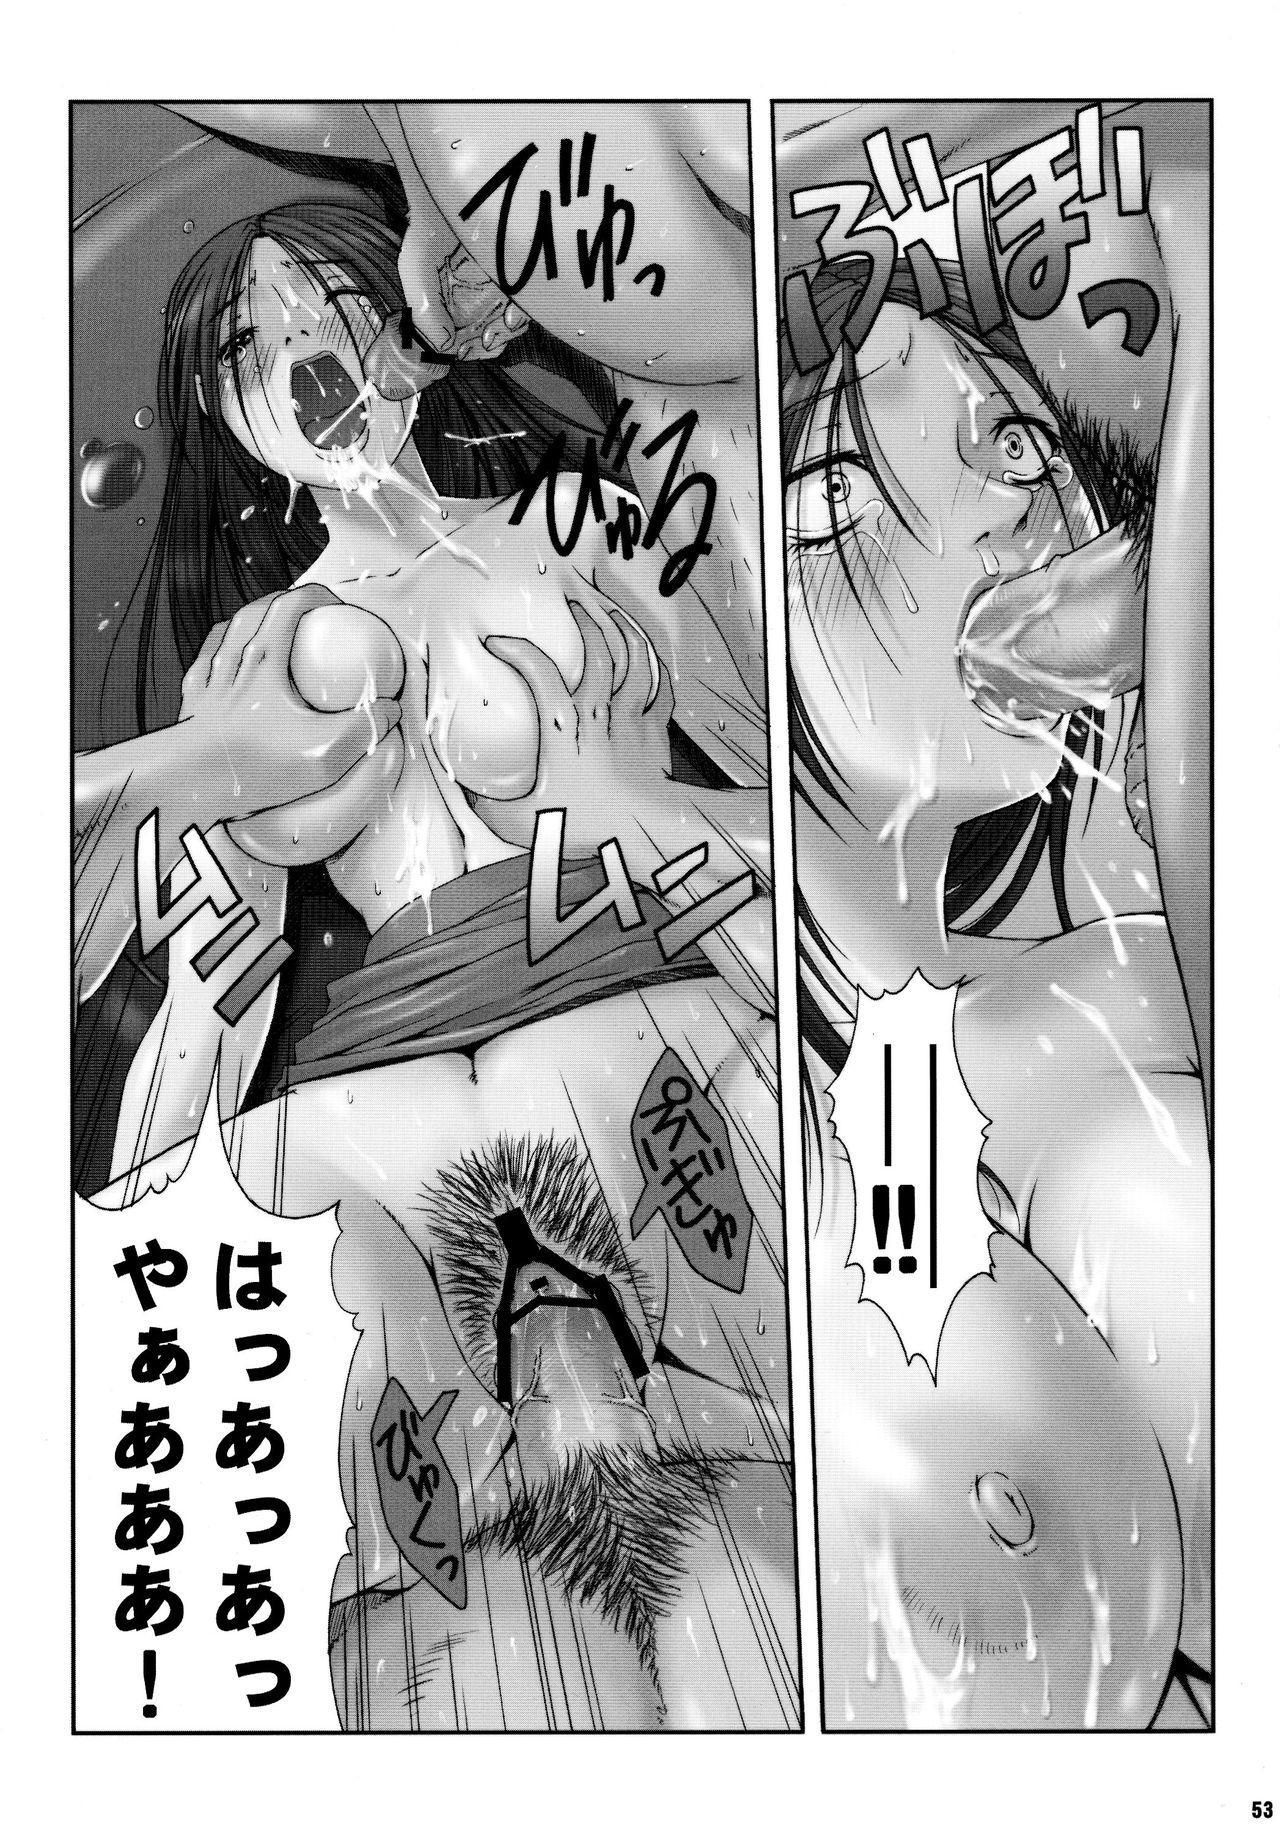 Misoka no 5 52